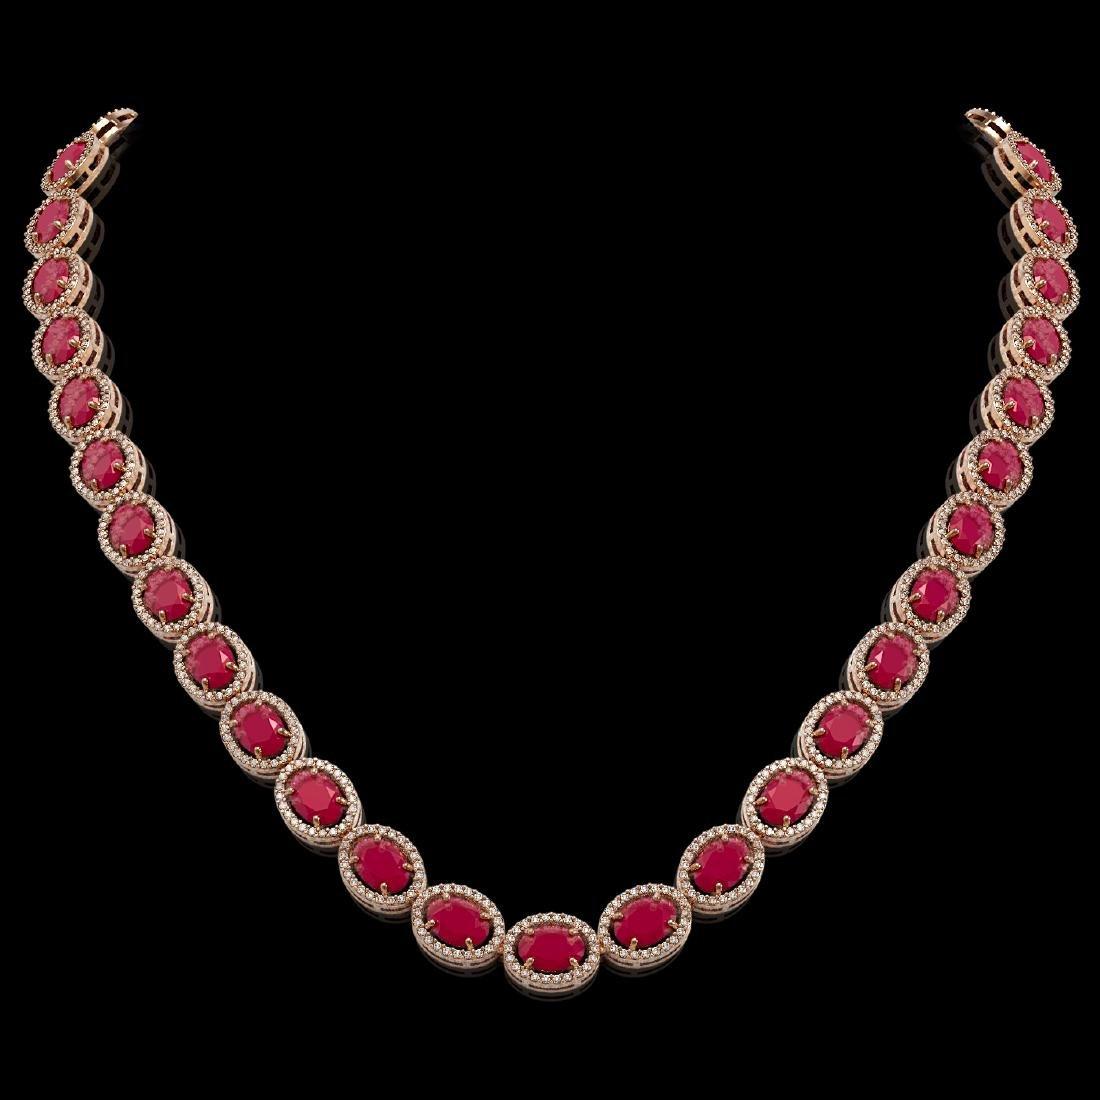 52.15 CTW Ruby & Diamond Halo Necklace 10K Rose Gold